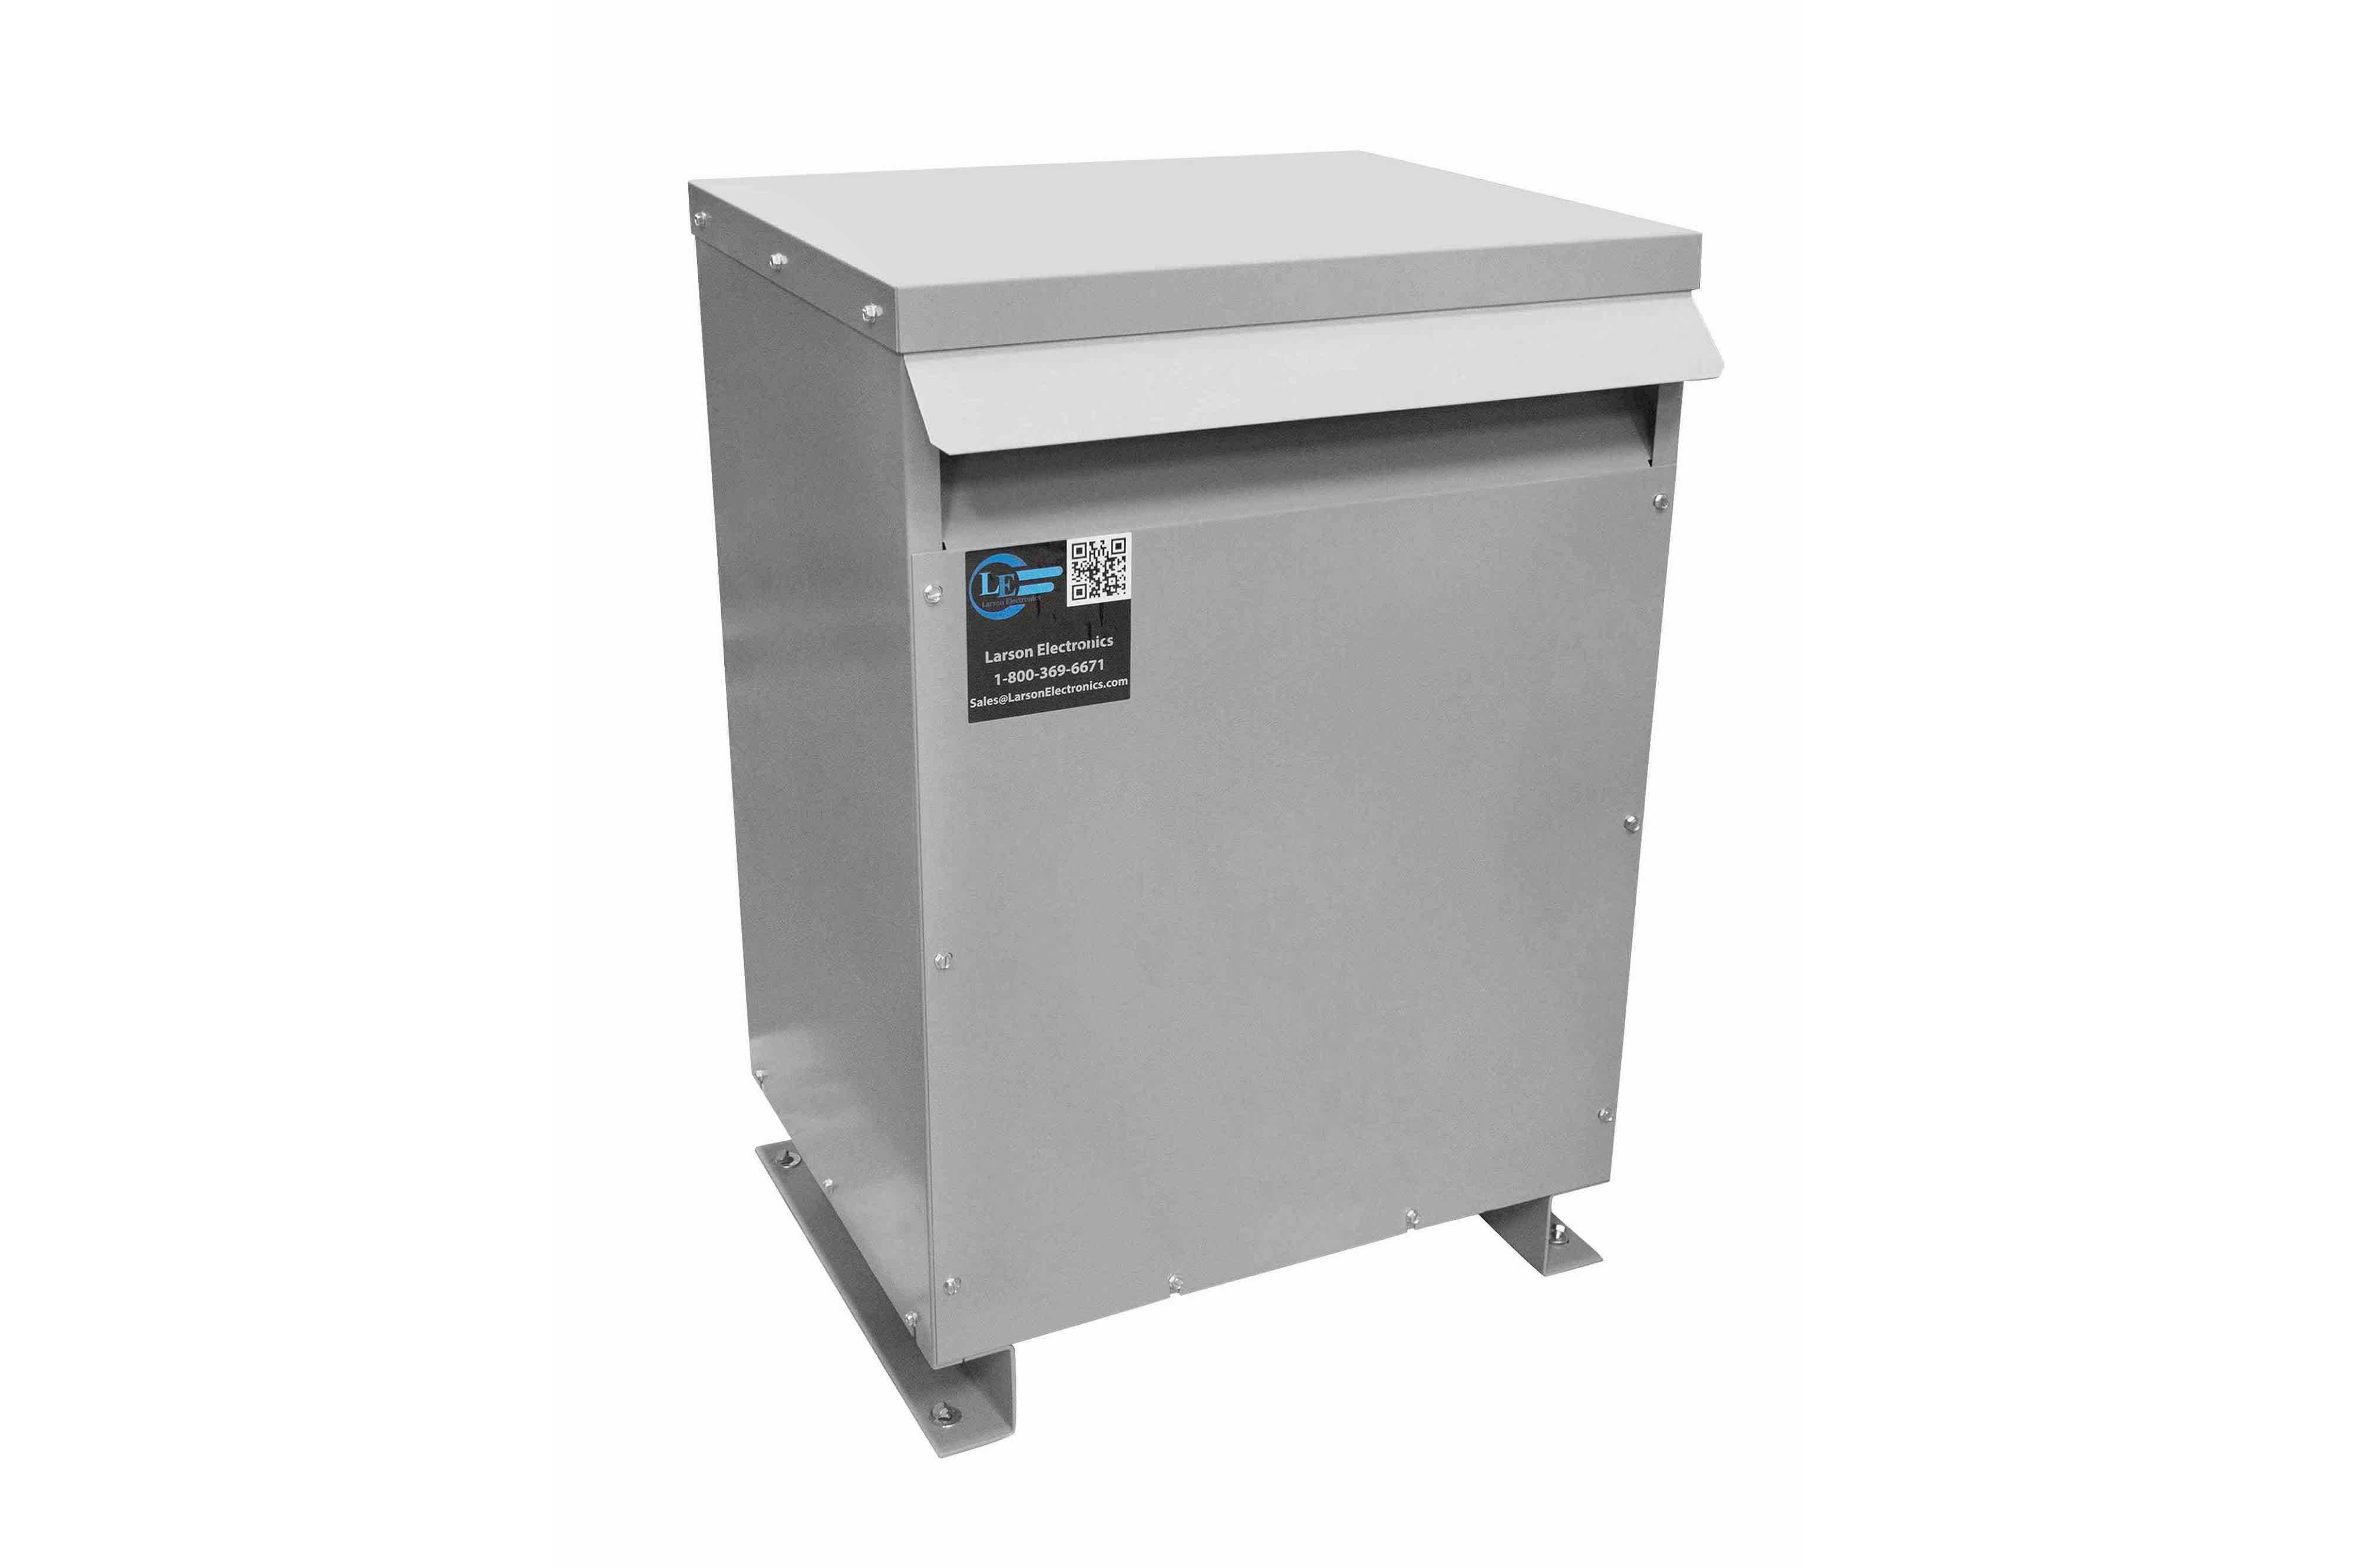 29 kVA 3PH Isolation Transformer, 575V Wye Primary, 480V Delta Secondary, N3R, Ventilated, 60 Hz